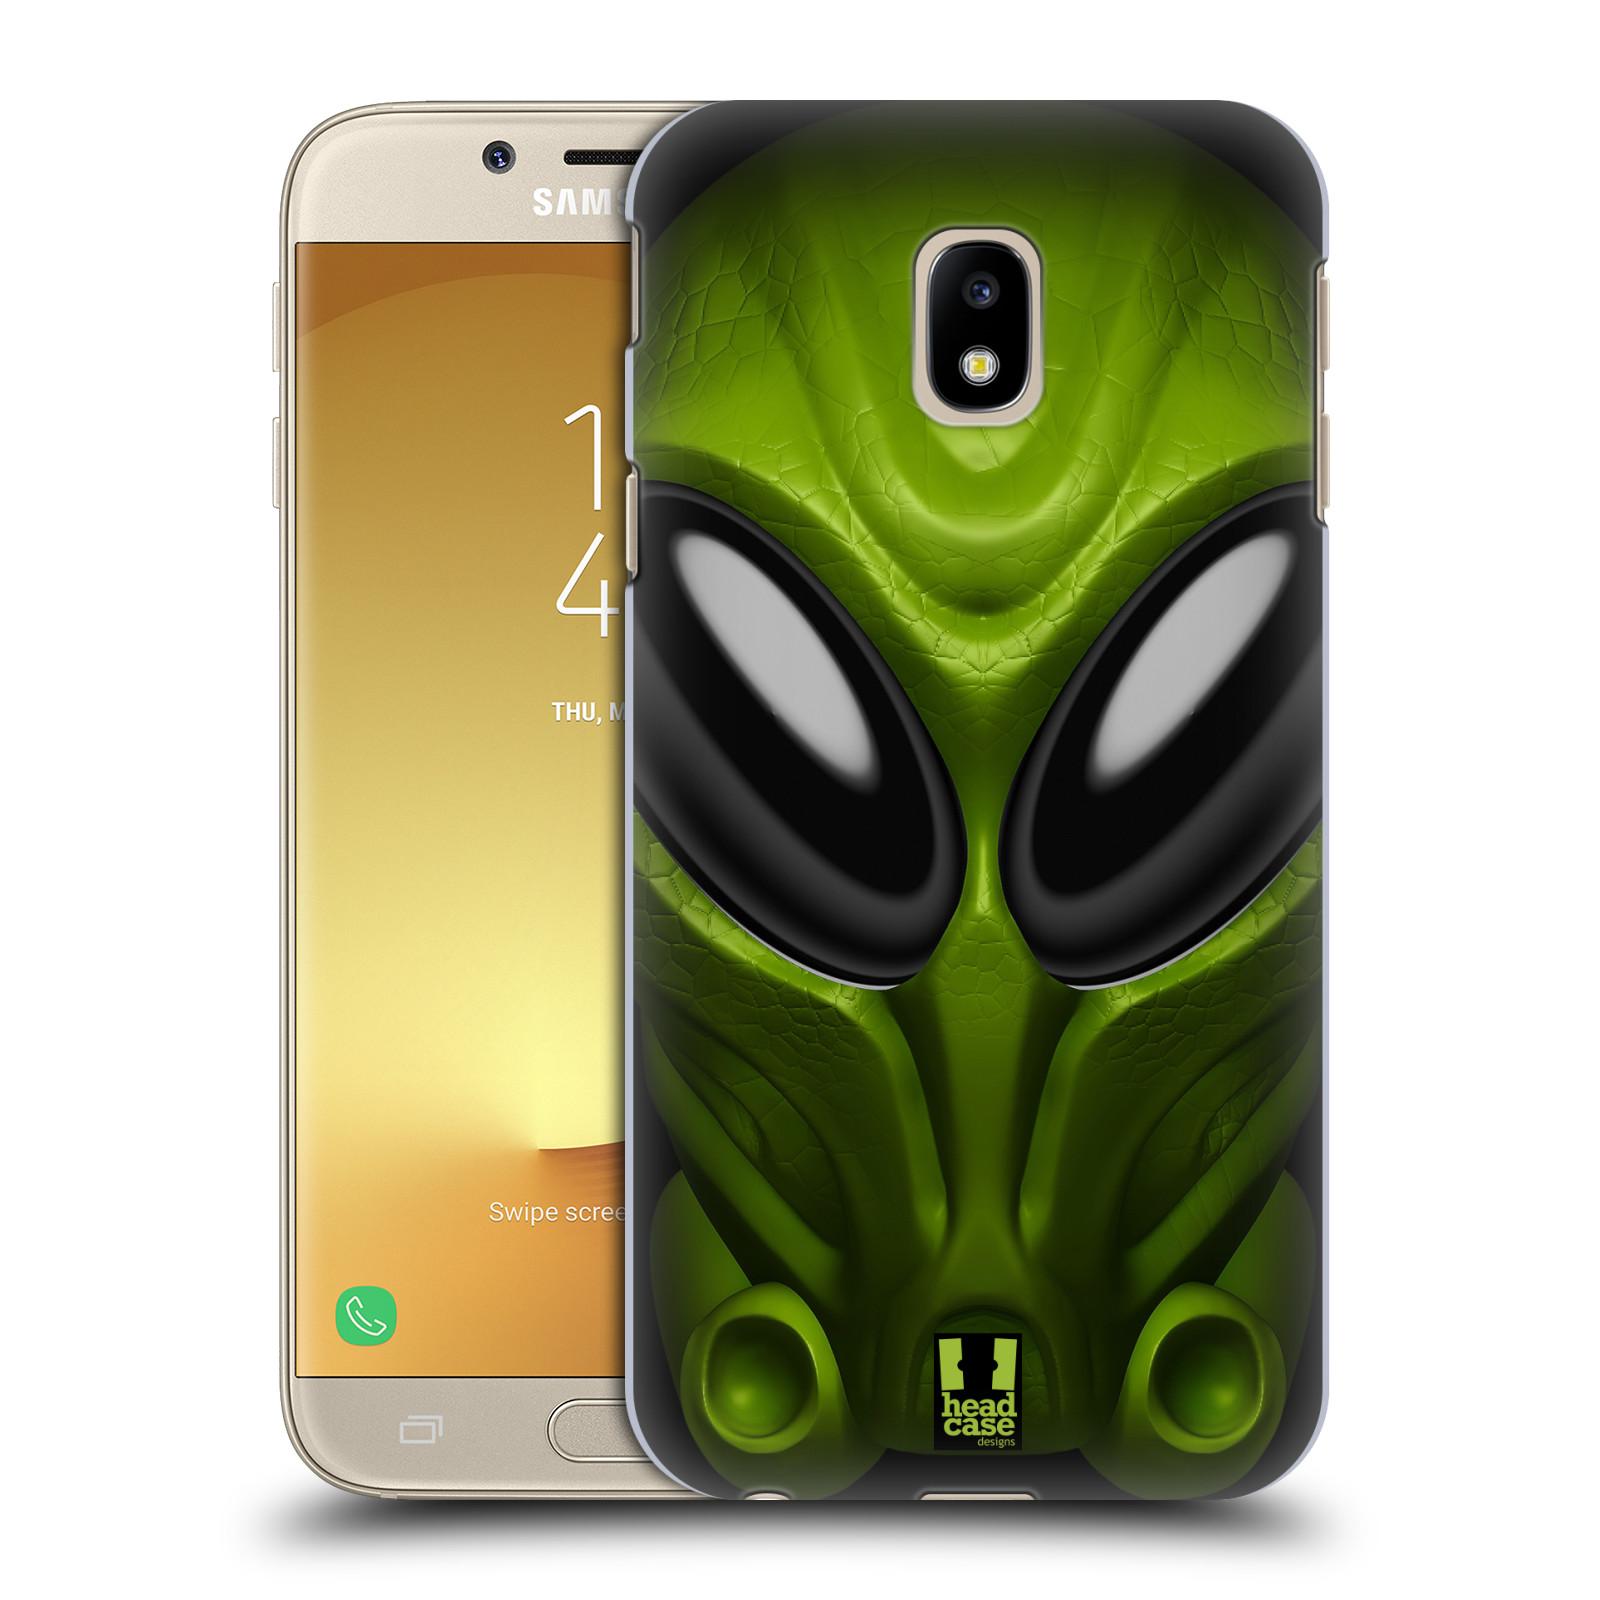 Plastové pouzdro na mobil Samsung Galaxy J3 (2017) - Head Case - Ufoun Mastermind